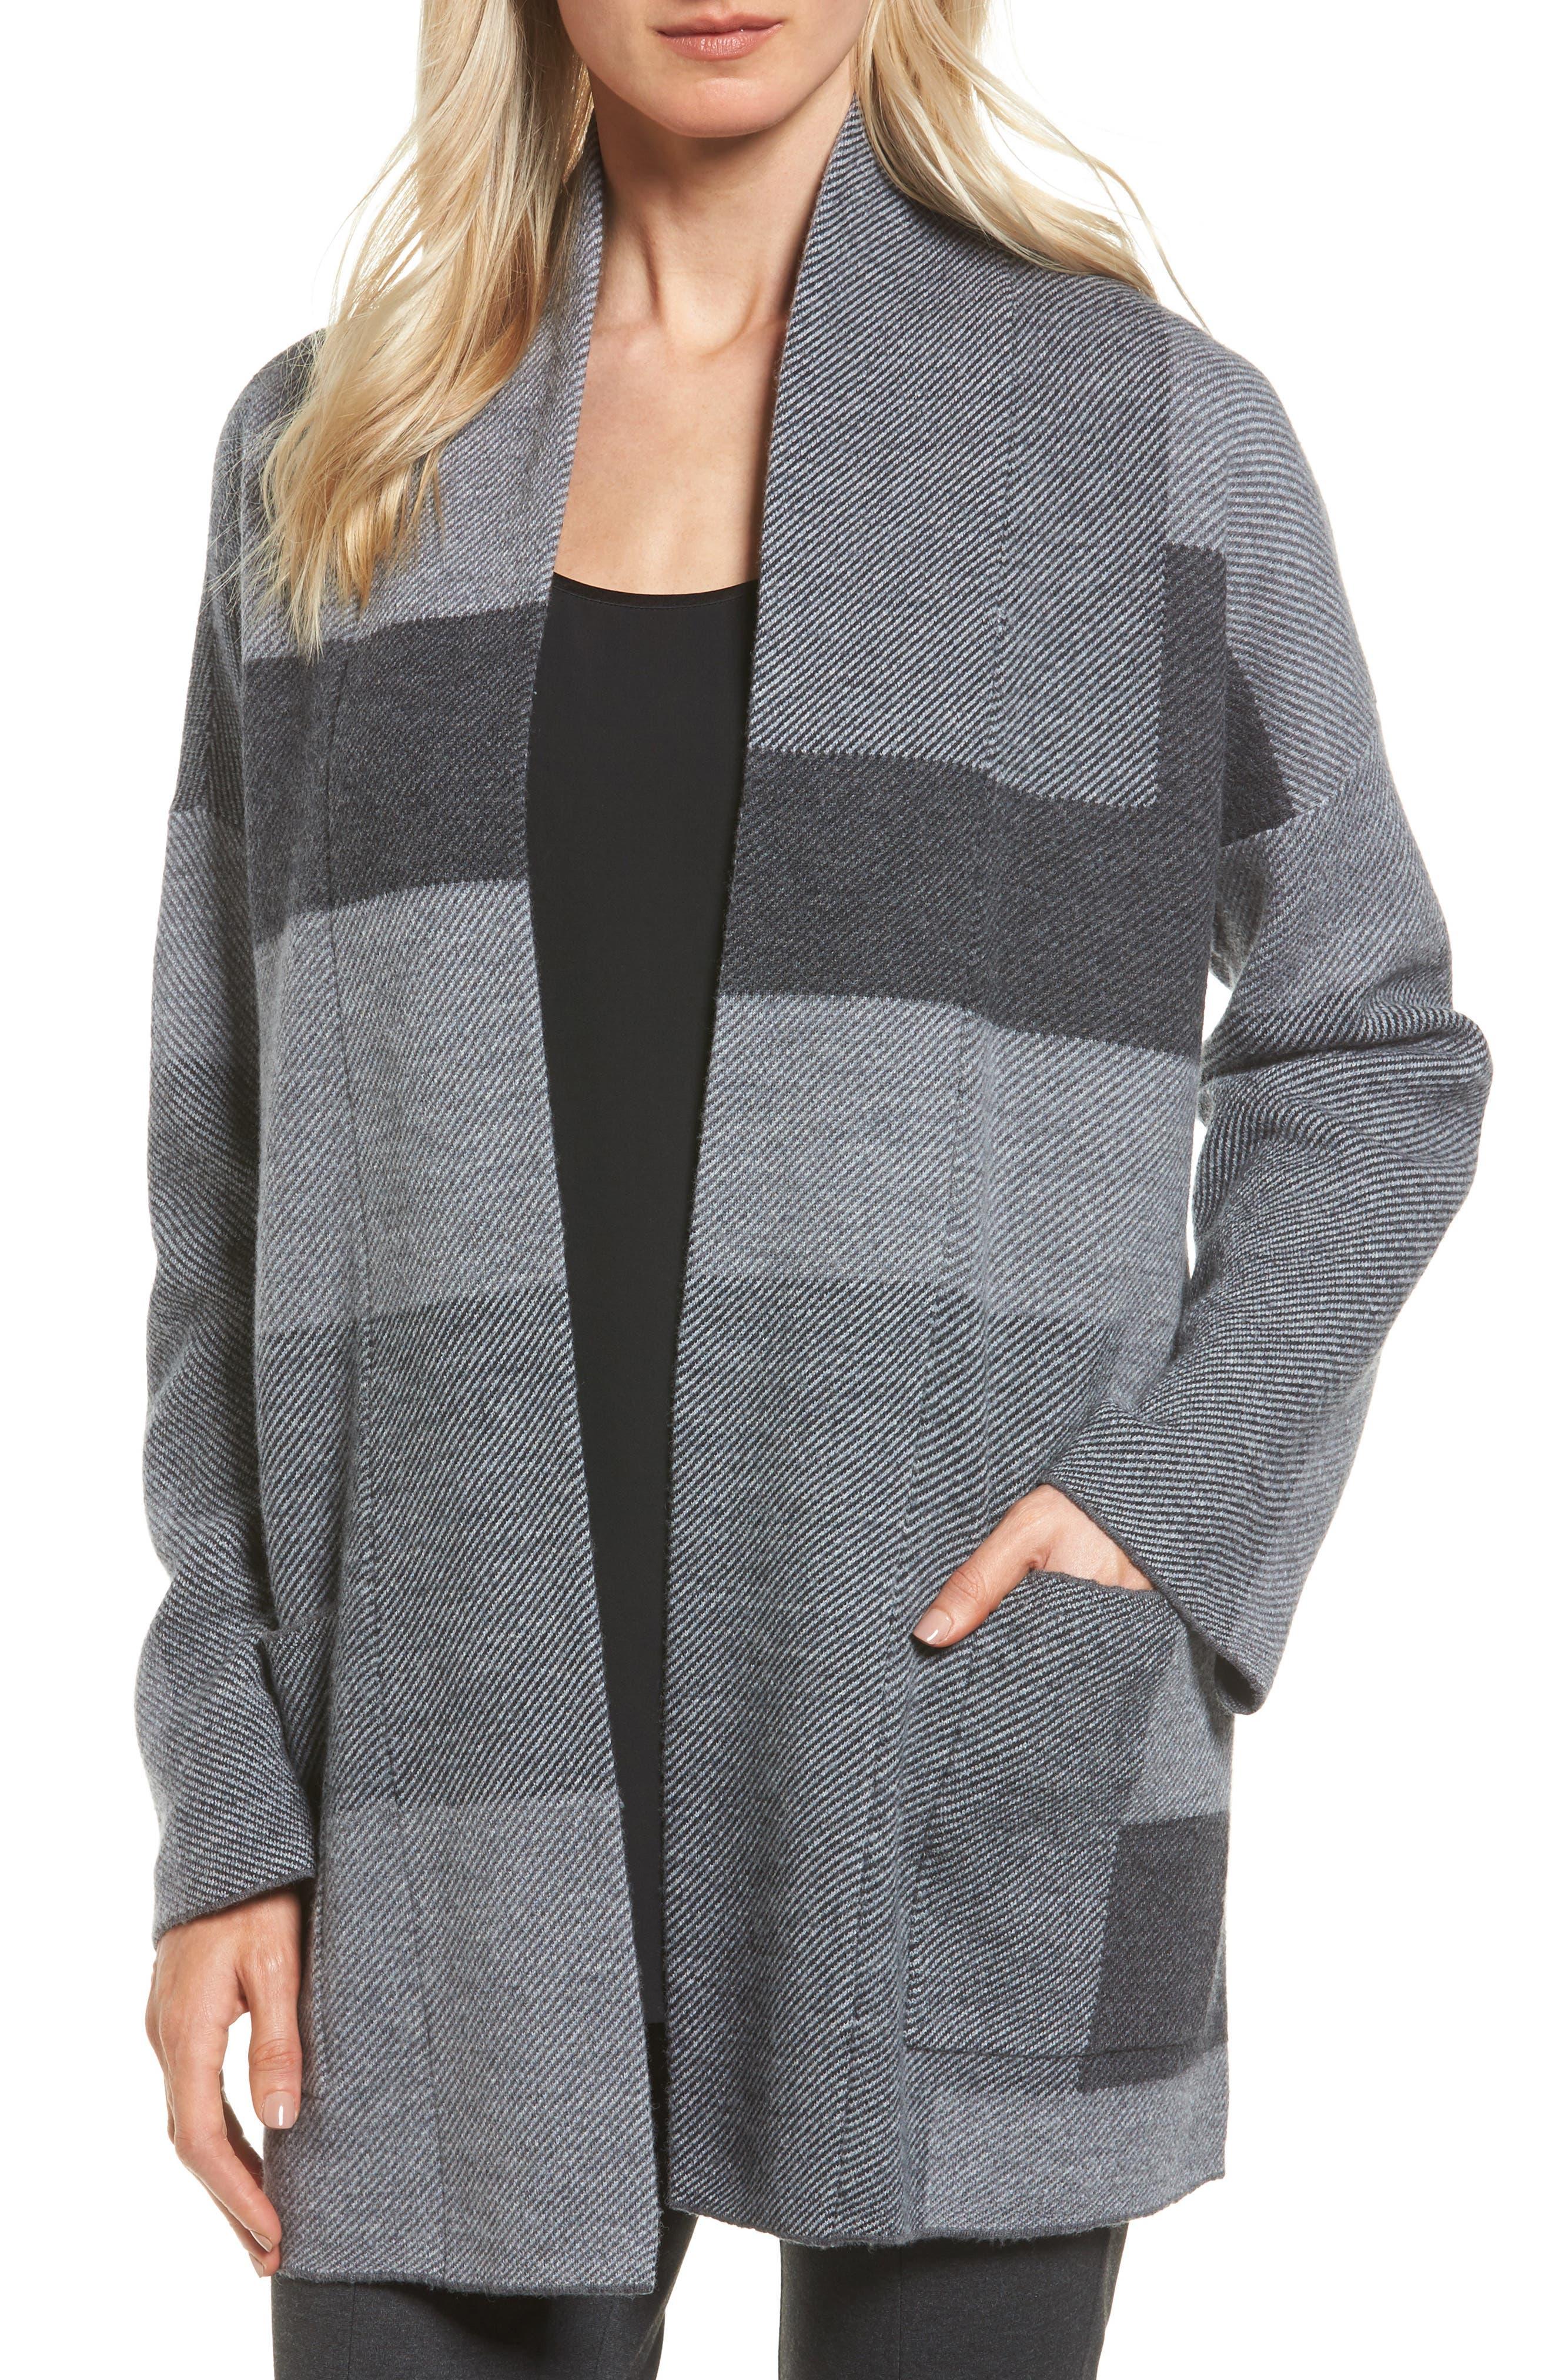 Eileen Fisher Colorblock Merino Wool Coat (Regular & Petite)